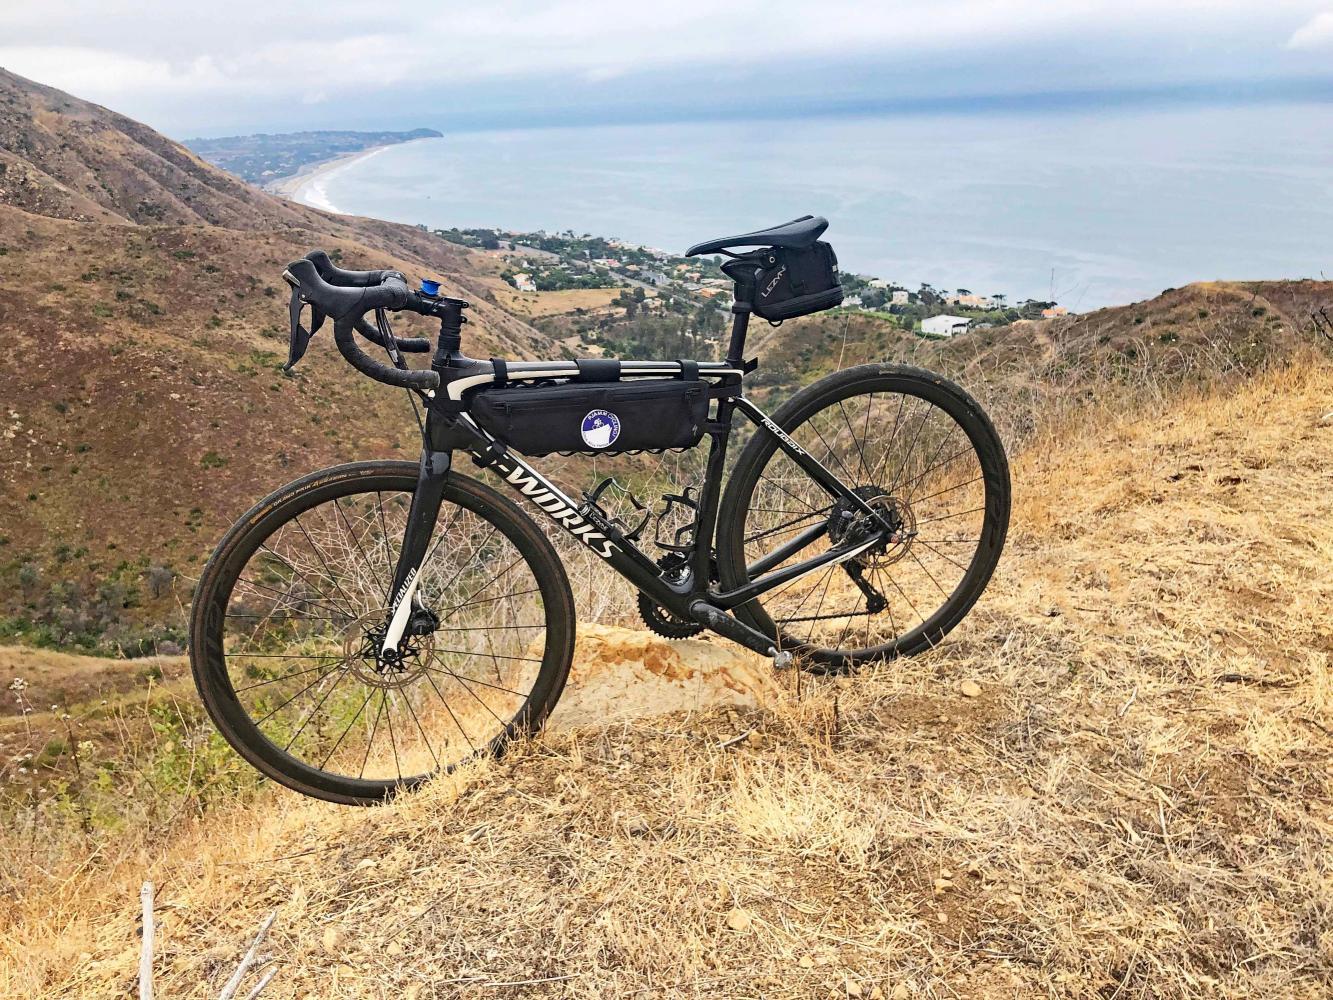 Encinal Canyon Road Bike Climb - PJAMM Cycling